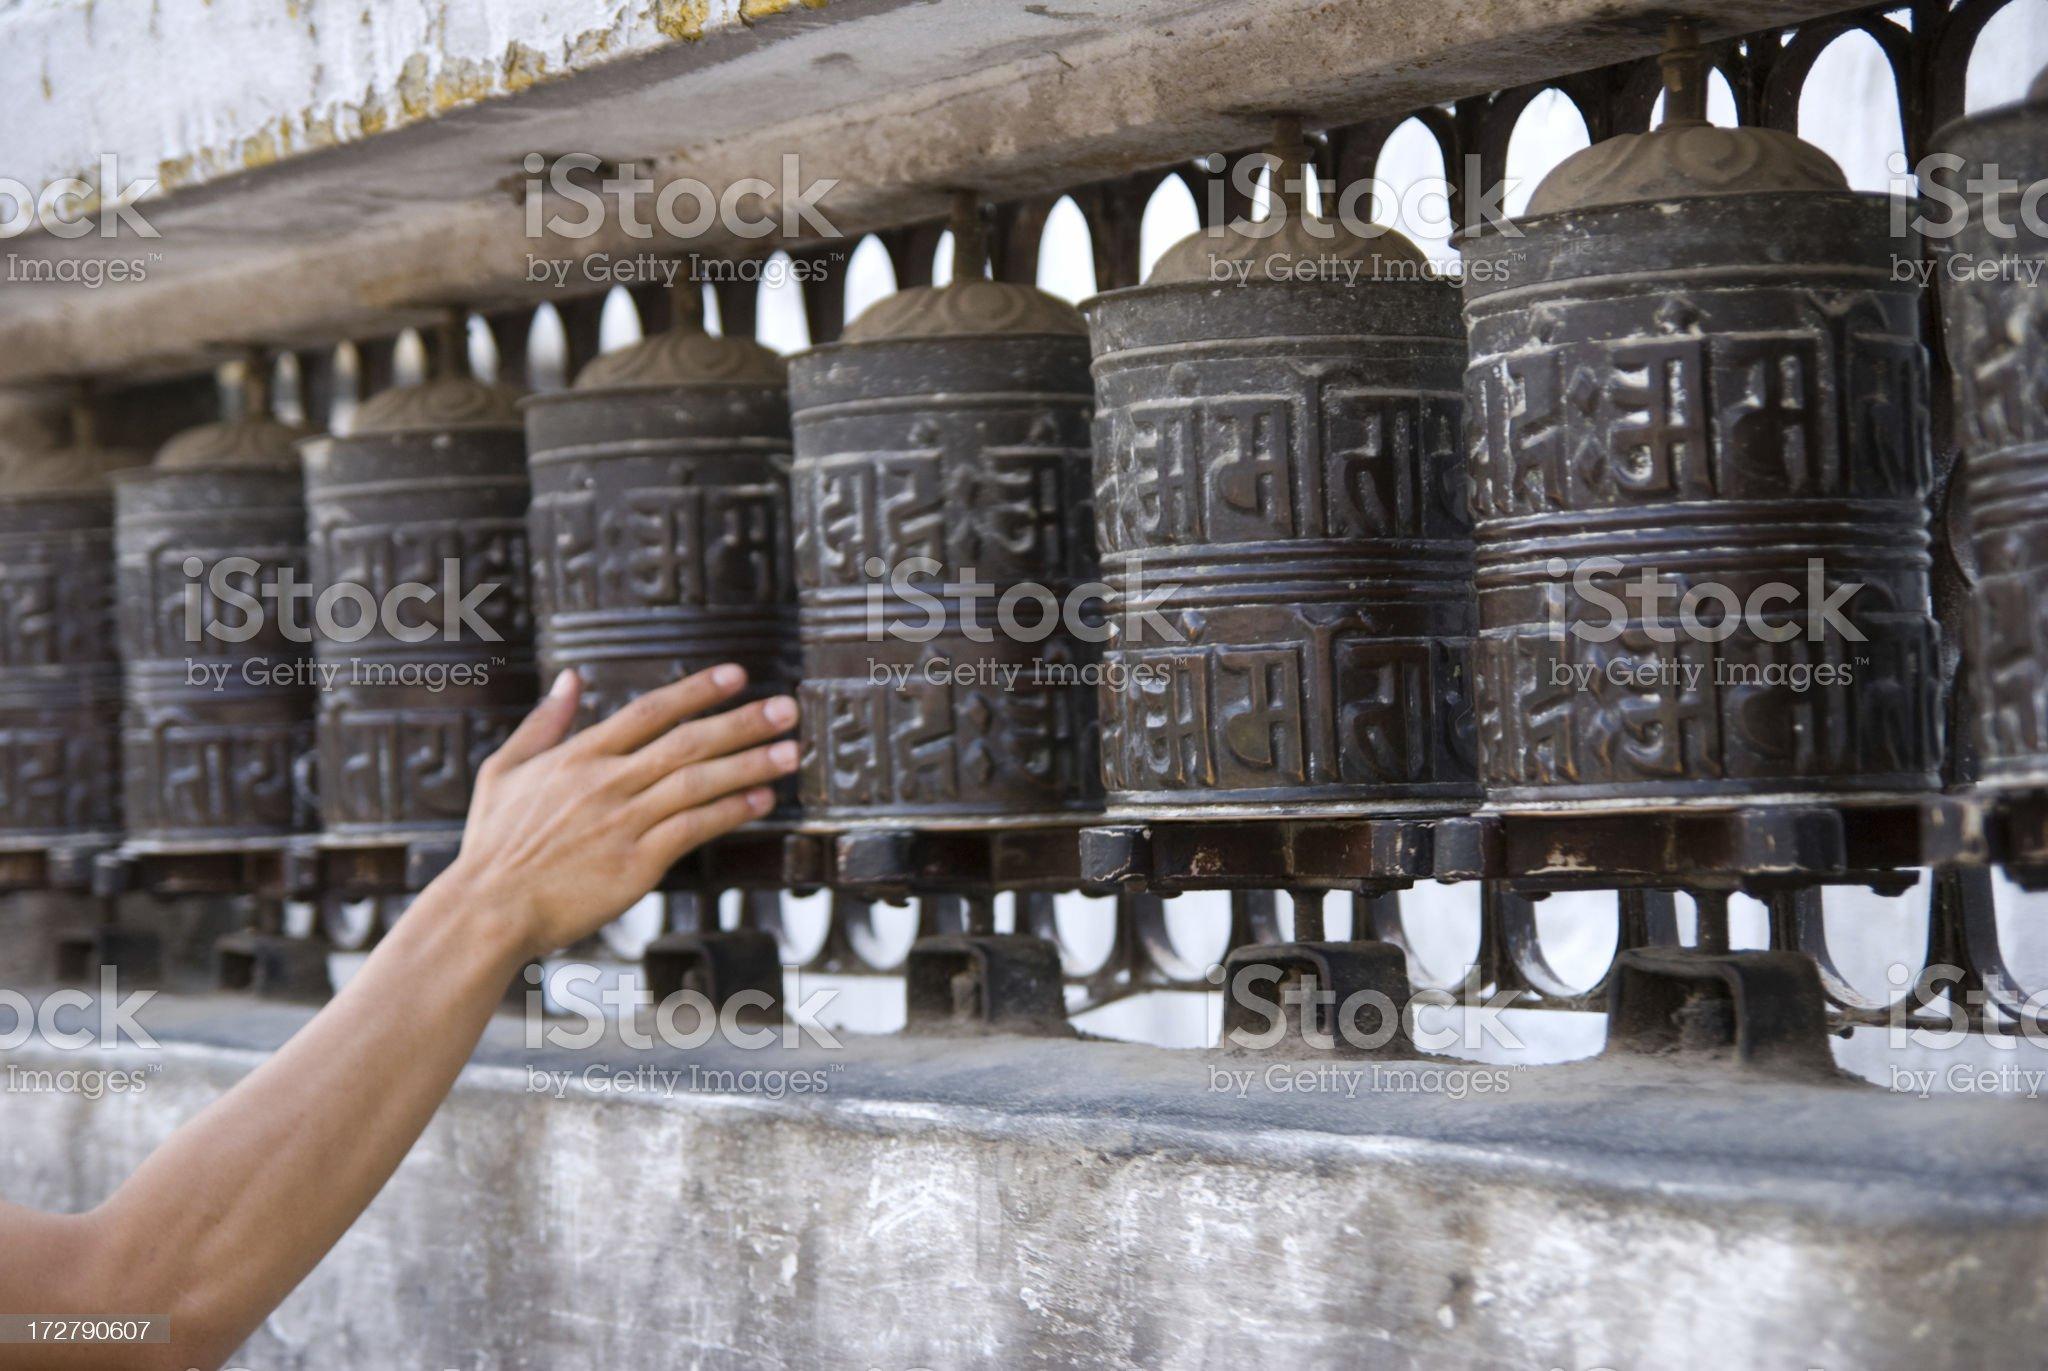 Rotating Buddhist Prayer Wheel royalty-free stock photo